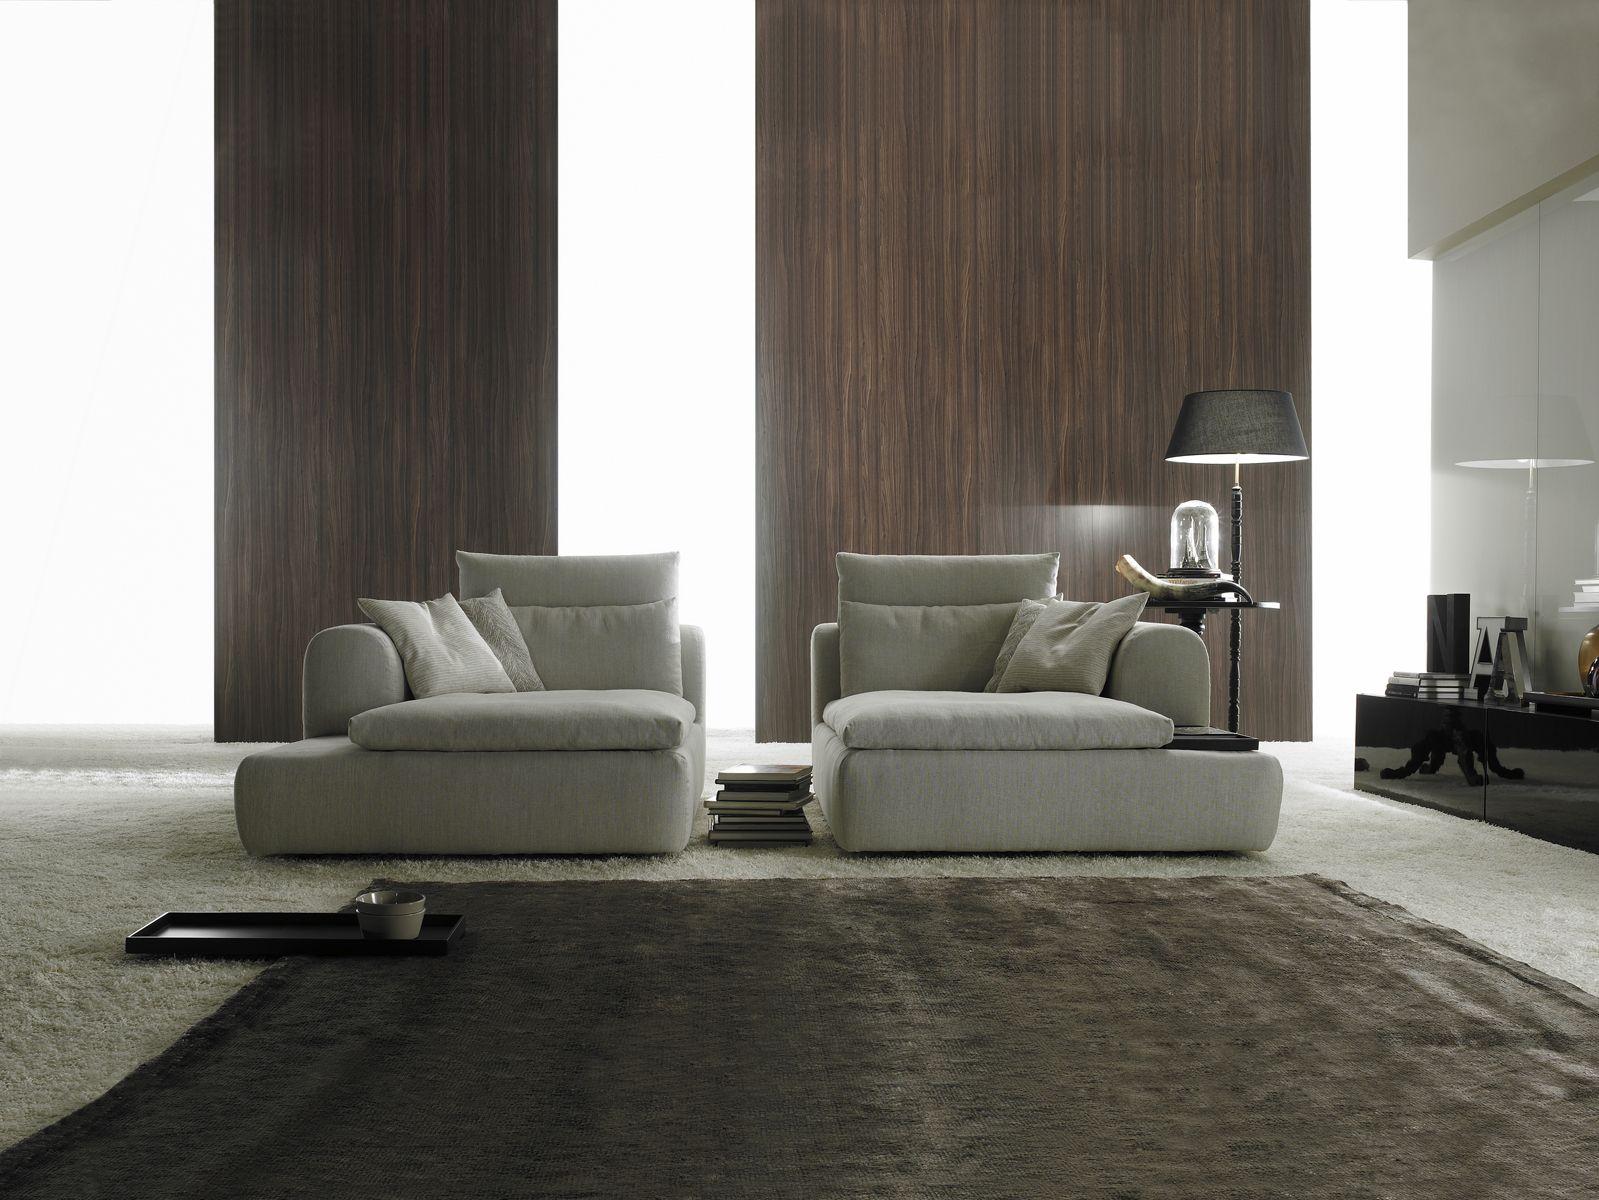 Polaris Designed For Living Srl sharpei | polaris (with images) | home decor, furniture